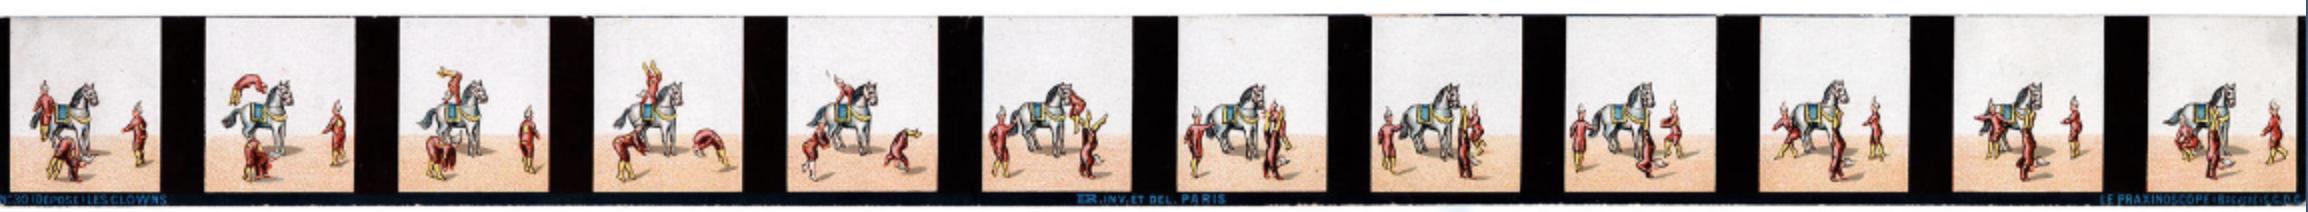 Bande d'un praxinoscope représentant les cabrioles de 3 clowns